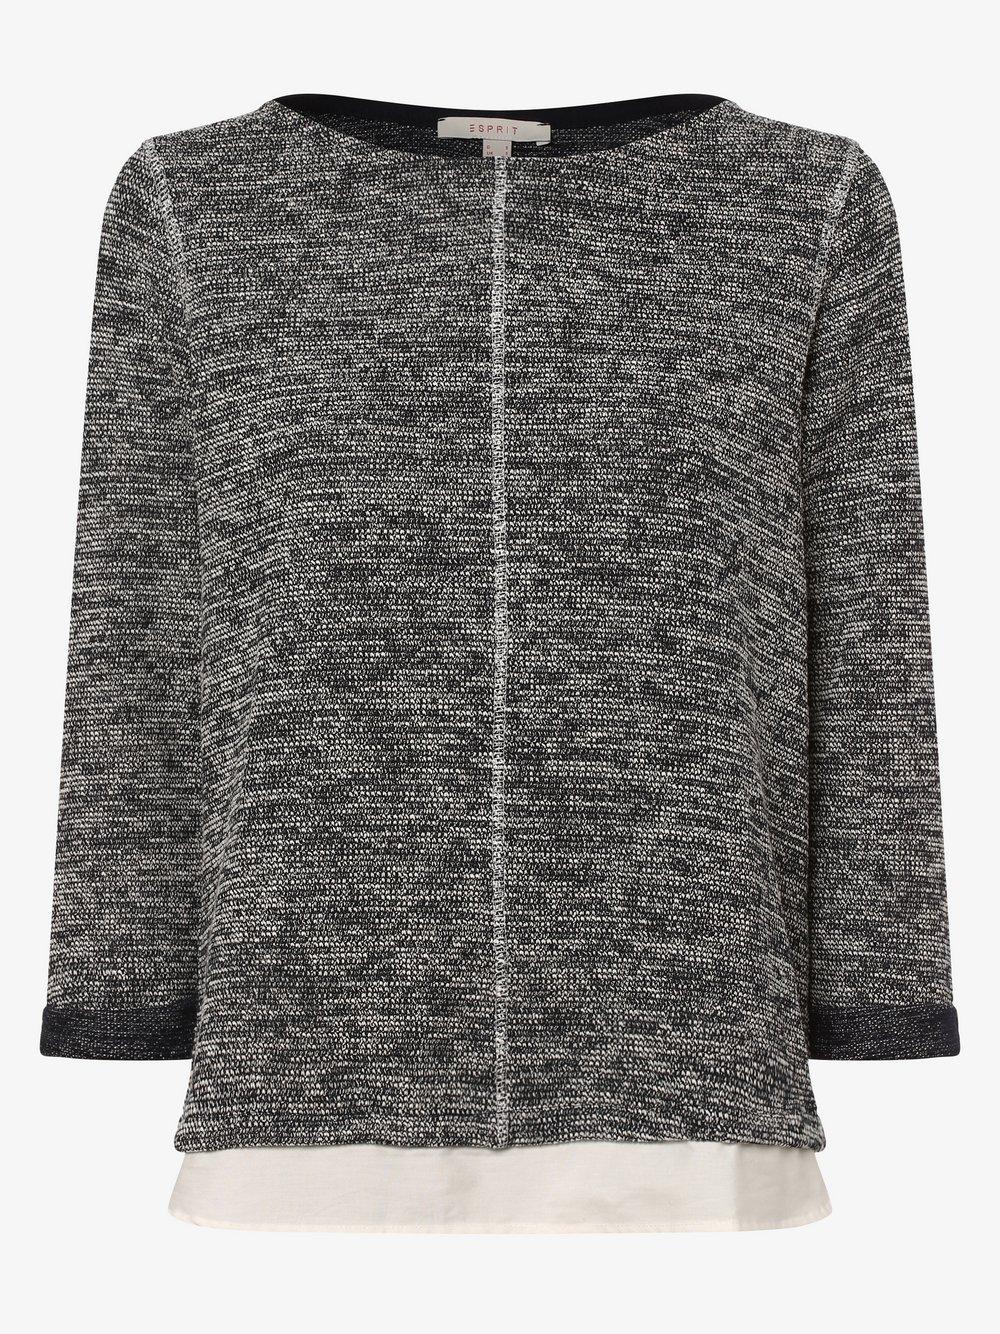 Esprit Casual – Damska bluza nierozpinana, niebieski Van Graaf 453849-0001-09970